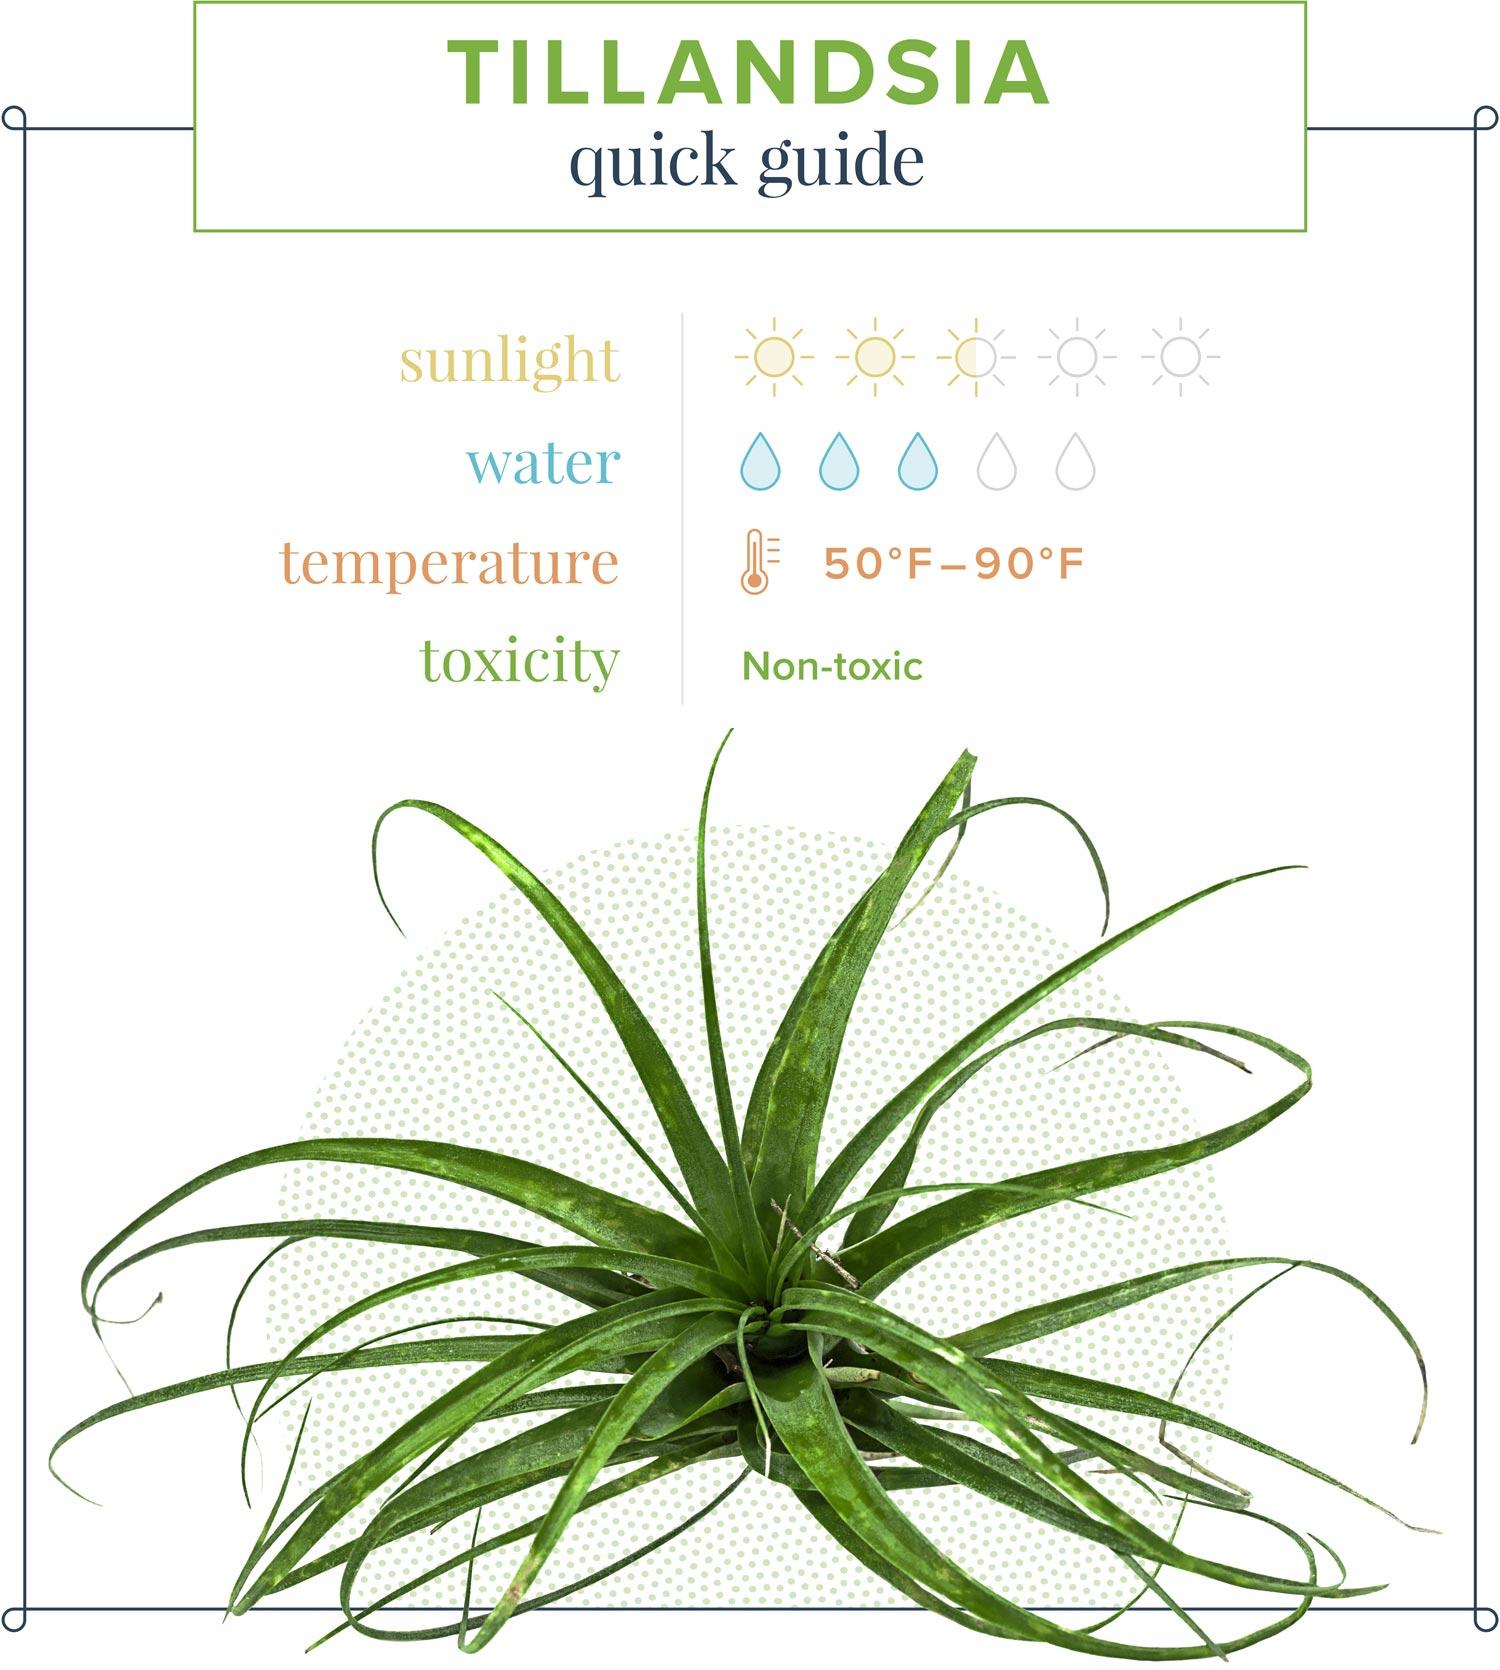 Air Plant (Tillandsia) Quick Guide Sunlight: 2.5 suns Water: 3 suns Temperature: 50–90° F Toxicity: Non-toxic